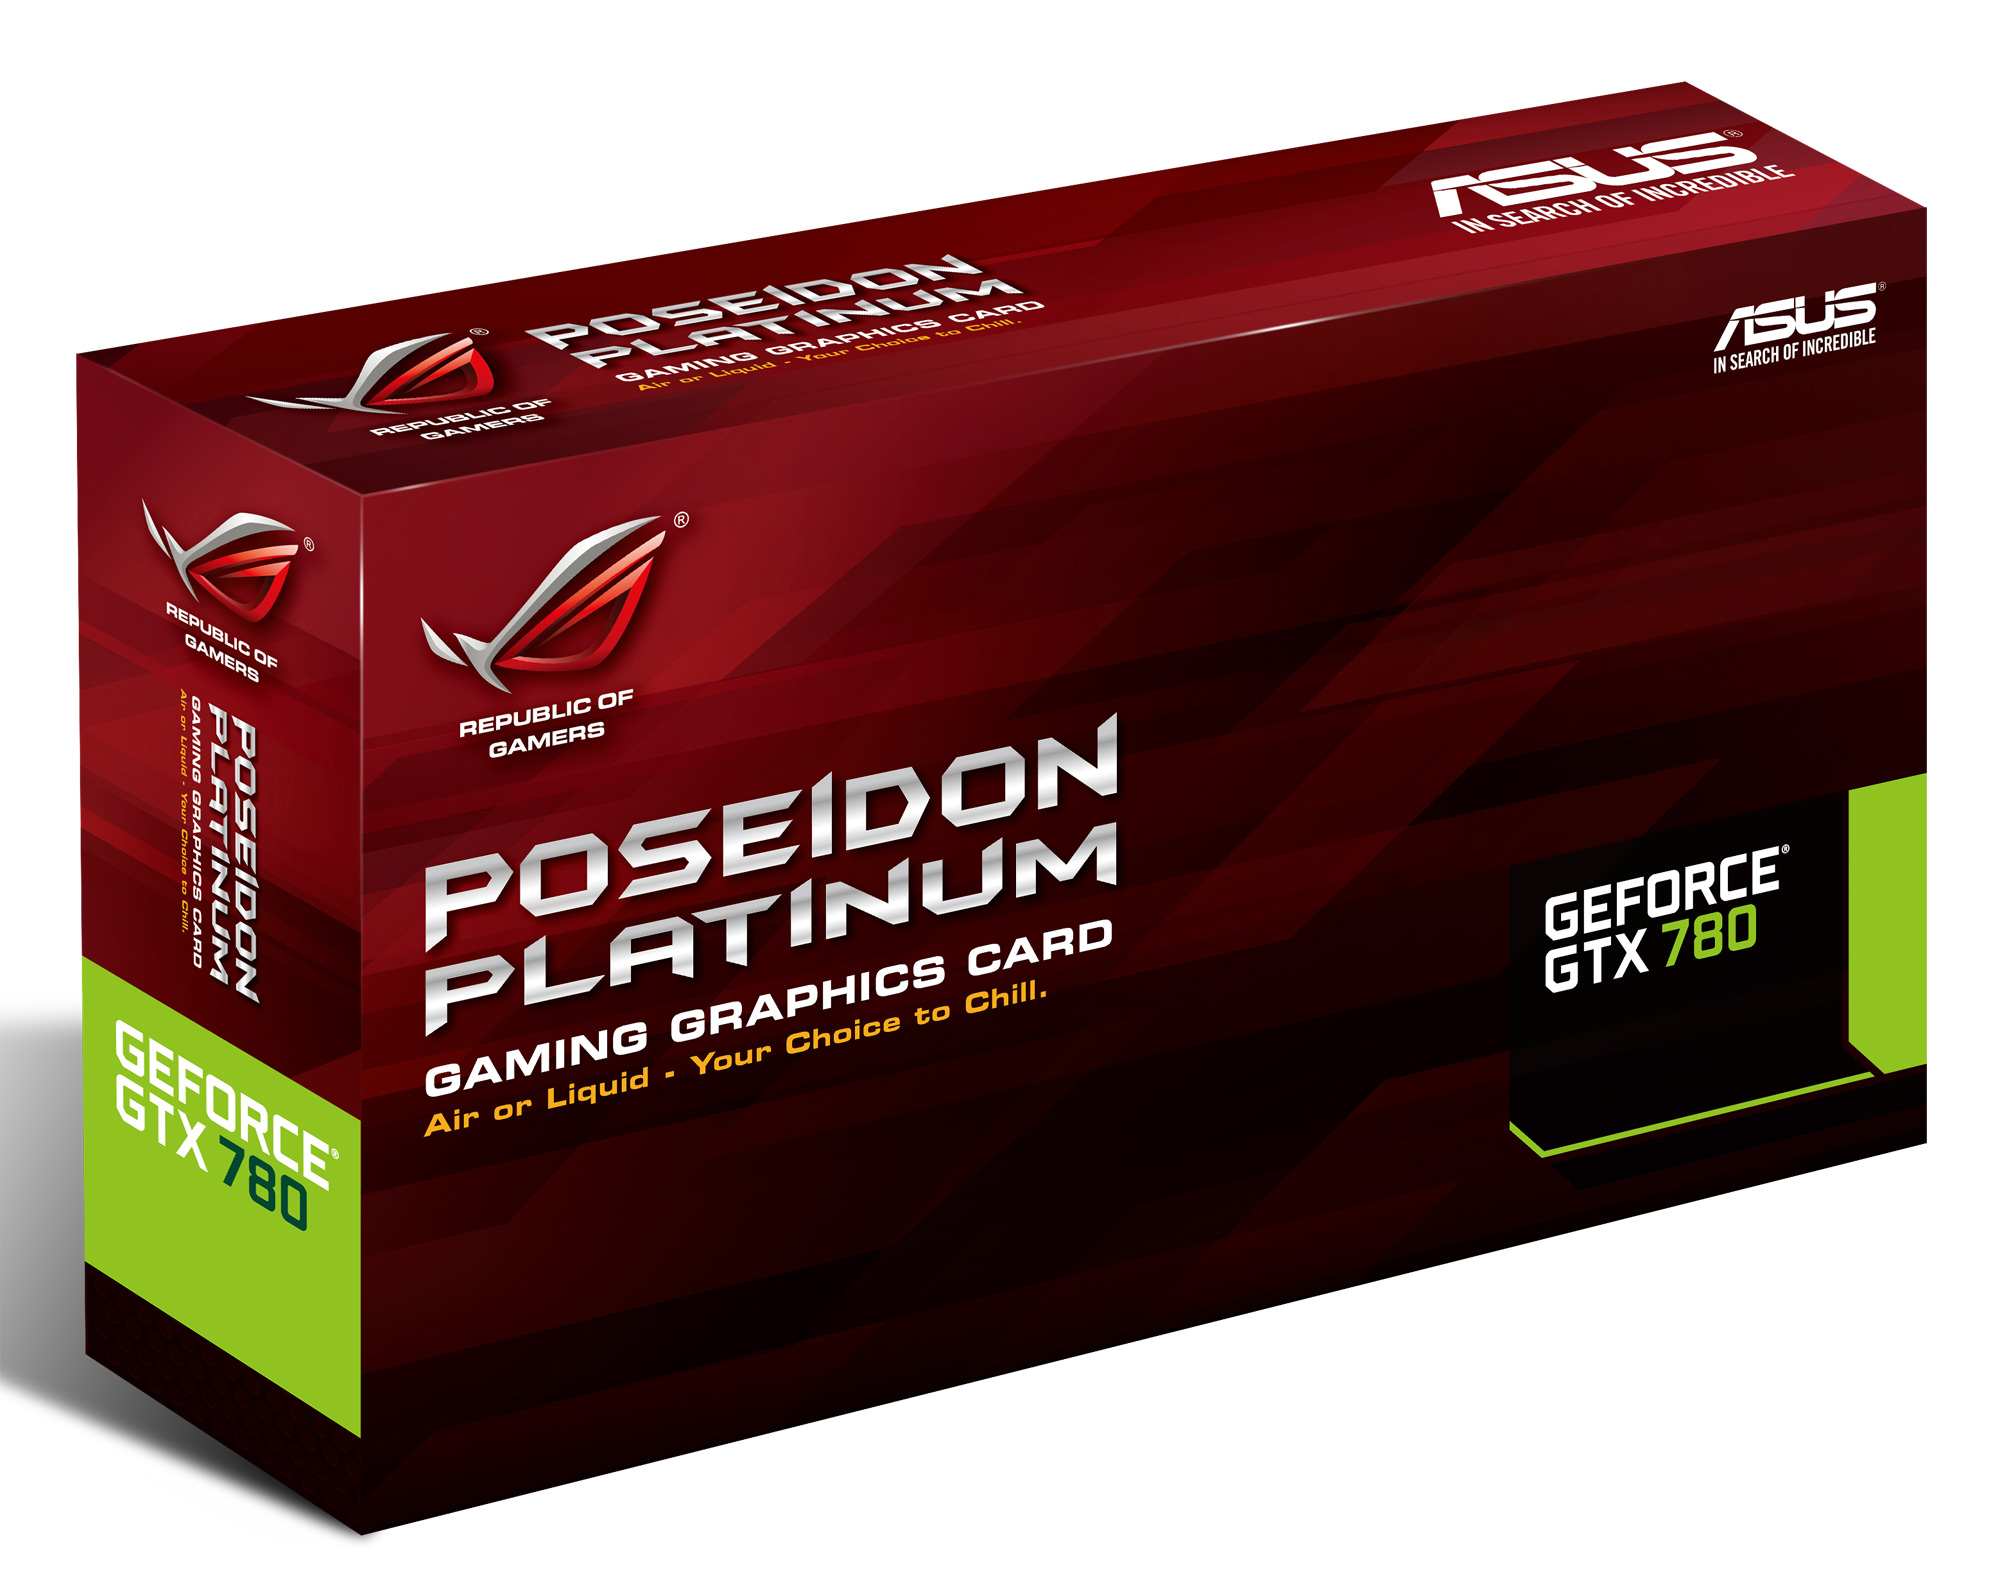 Asus Rog Poseidon Hybrid Cooled Gtx780 Graphics Card Re Doovi - Asus rog announces poseidon gtx 780 graphics card